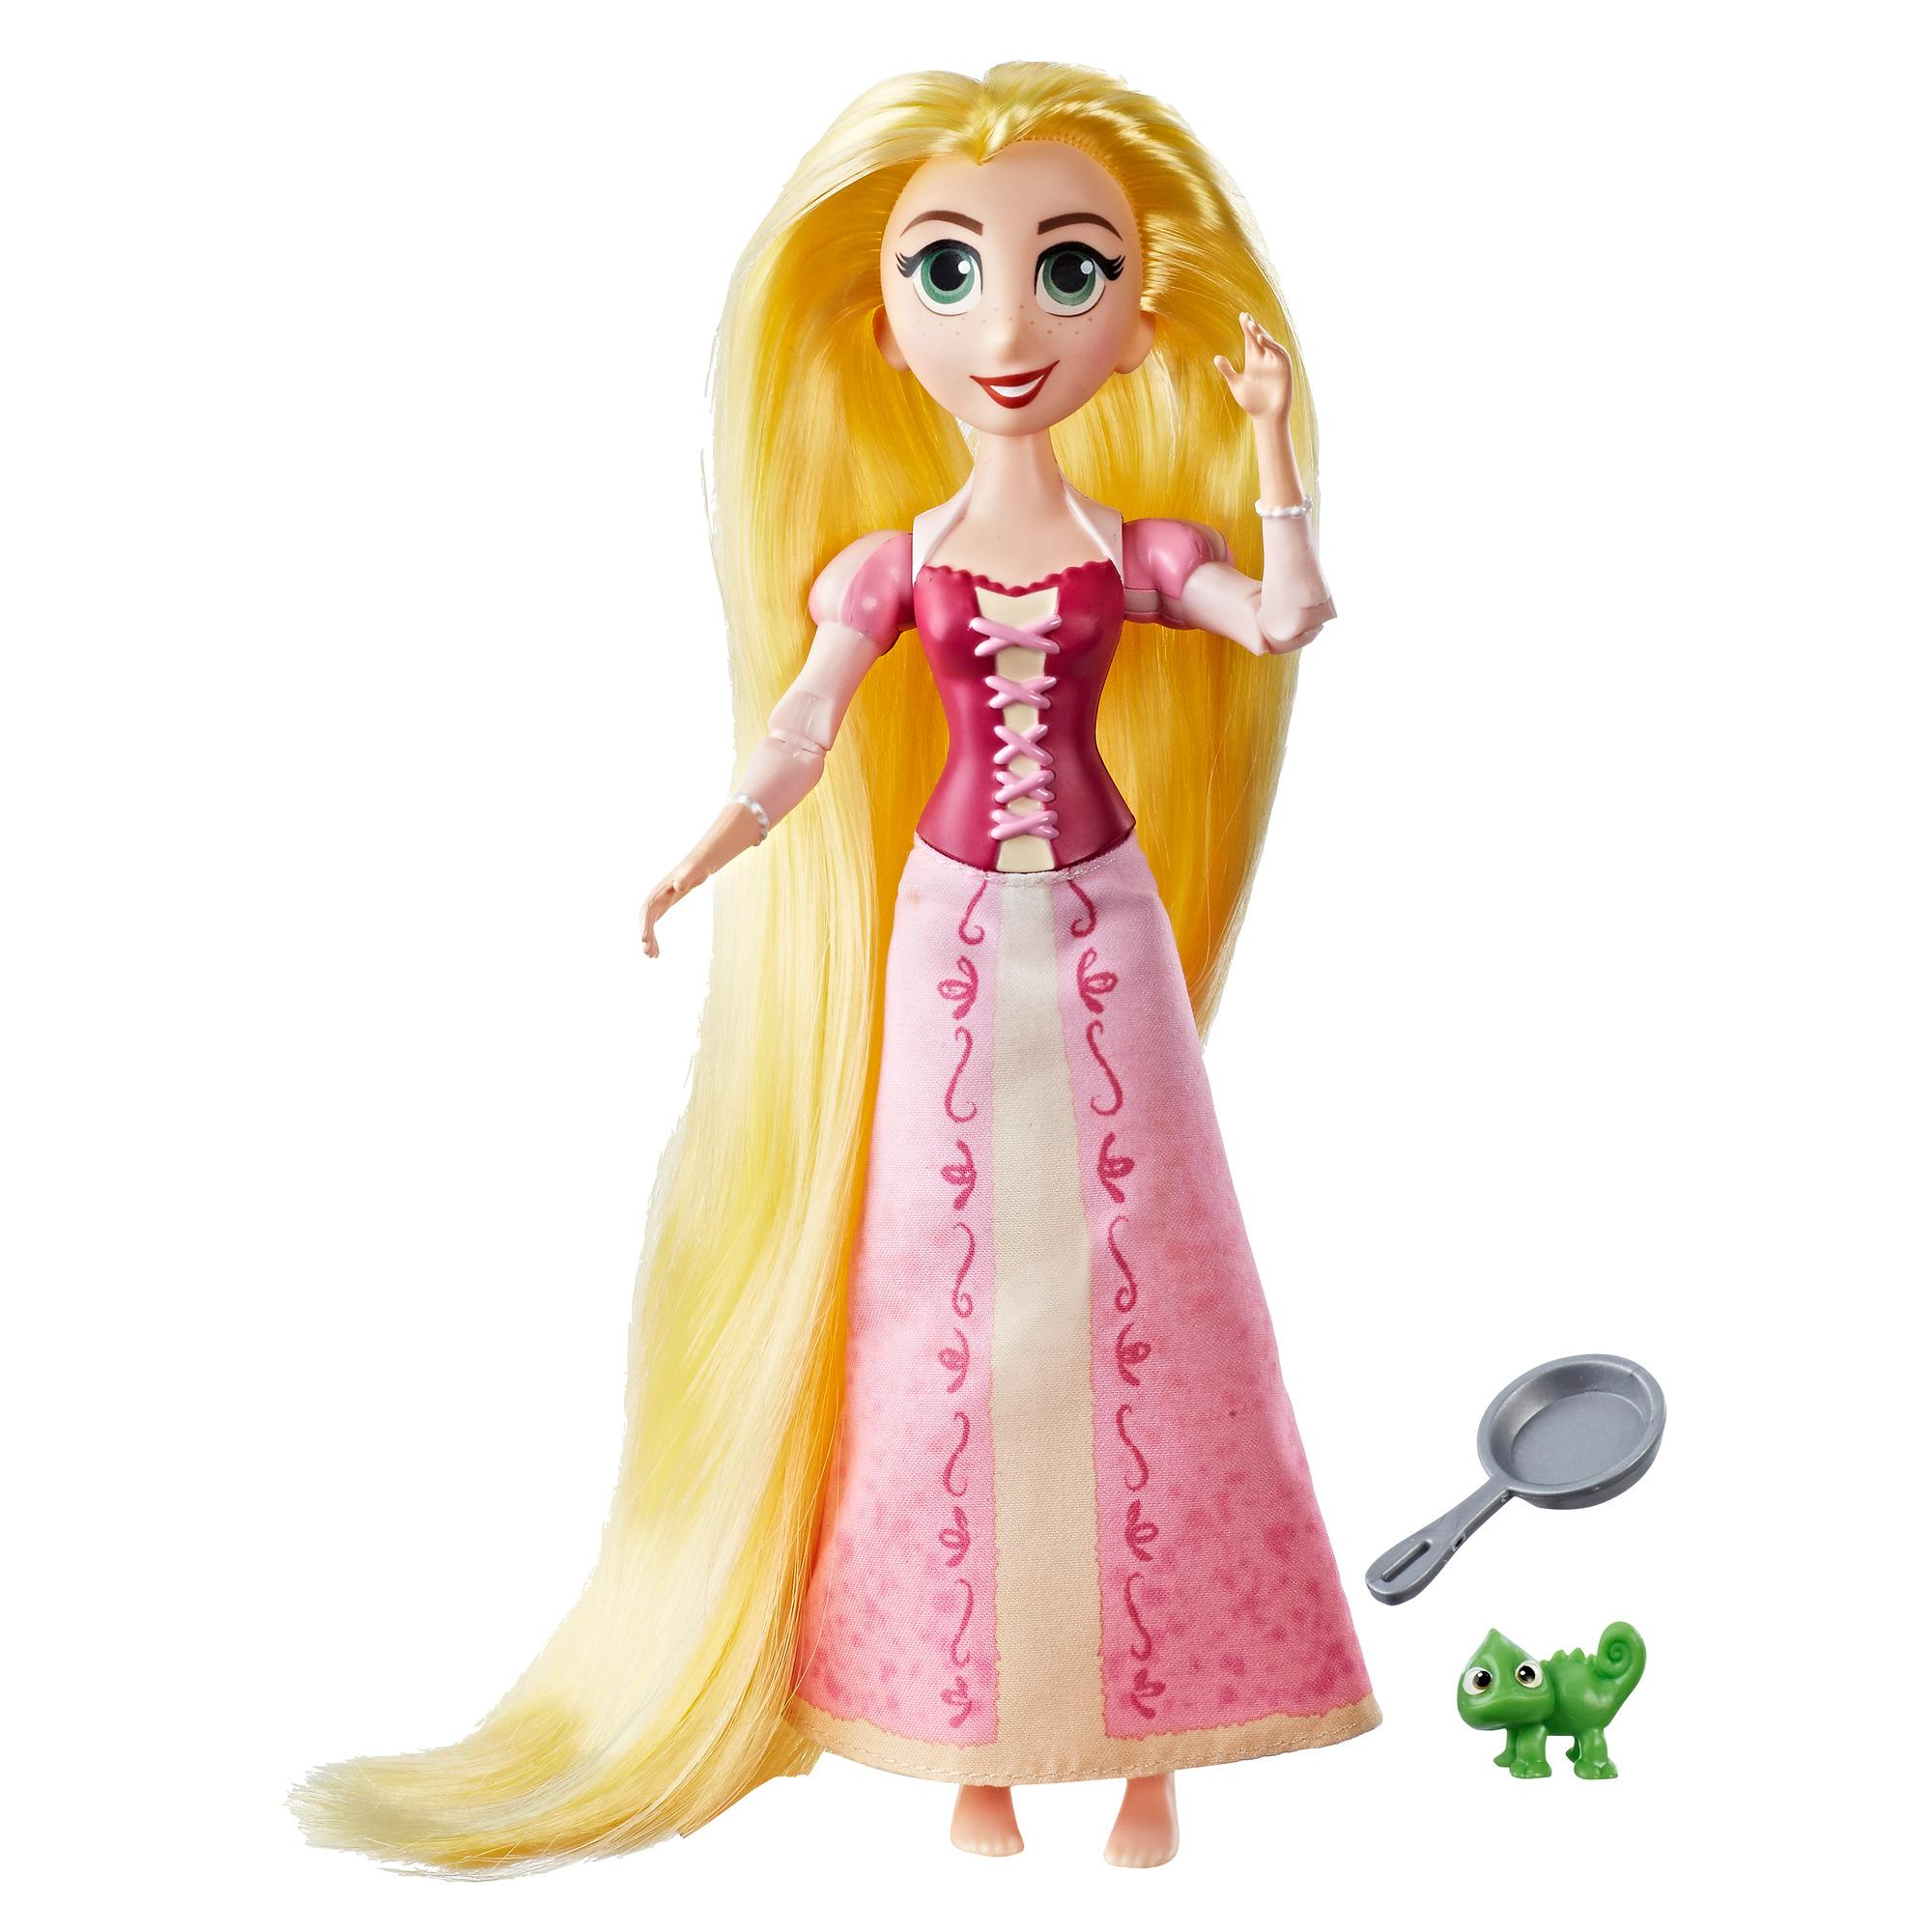 Disney Serie Enredados otra vez - Rapunzel y Pascal